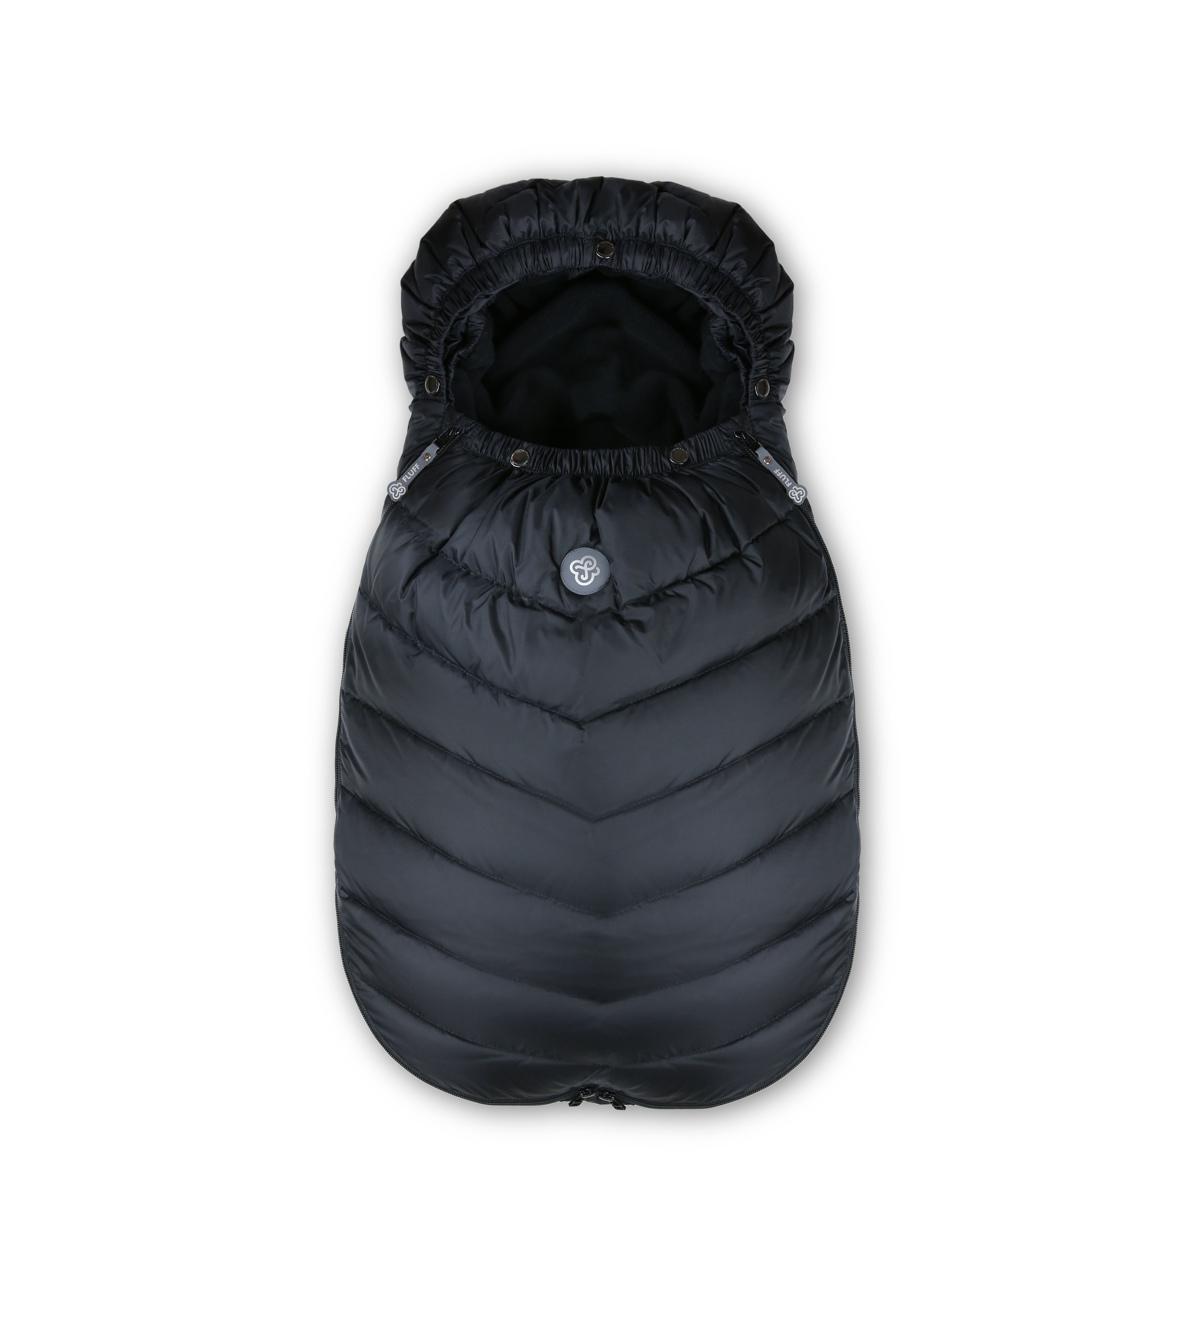 Black sleeping bag